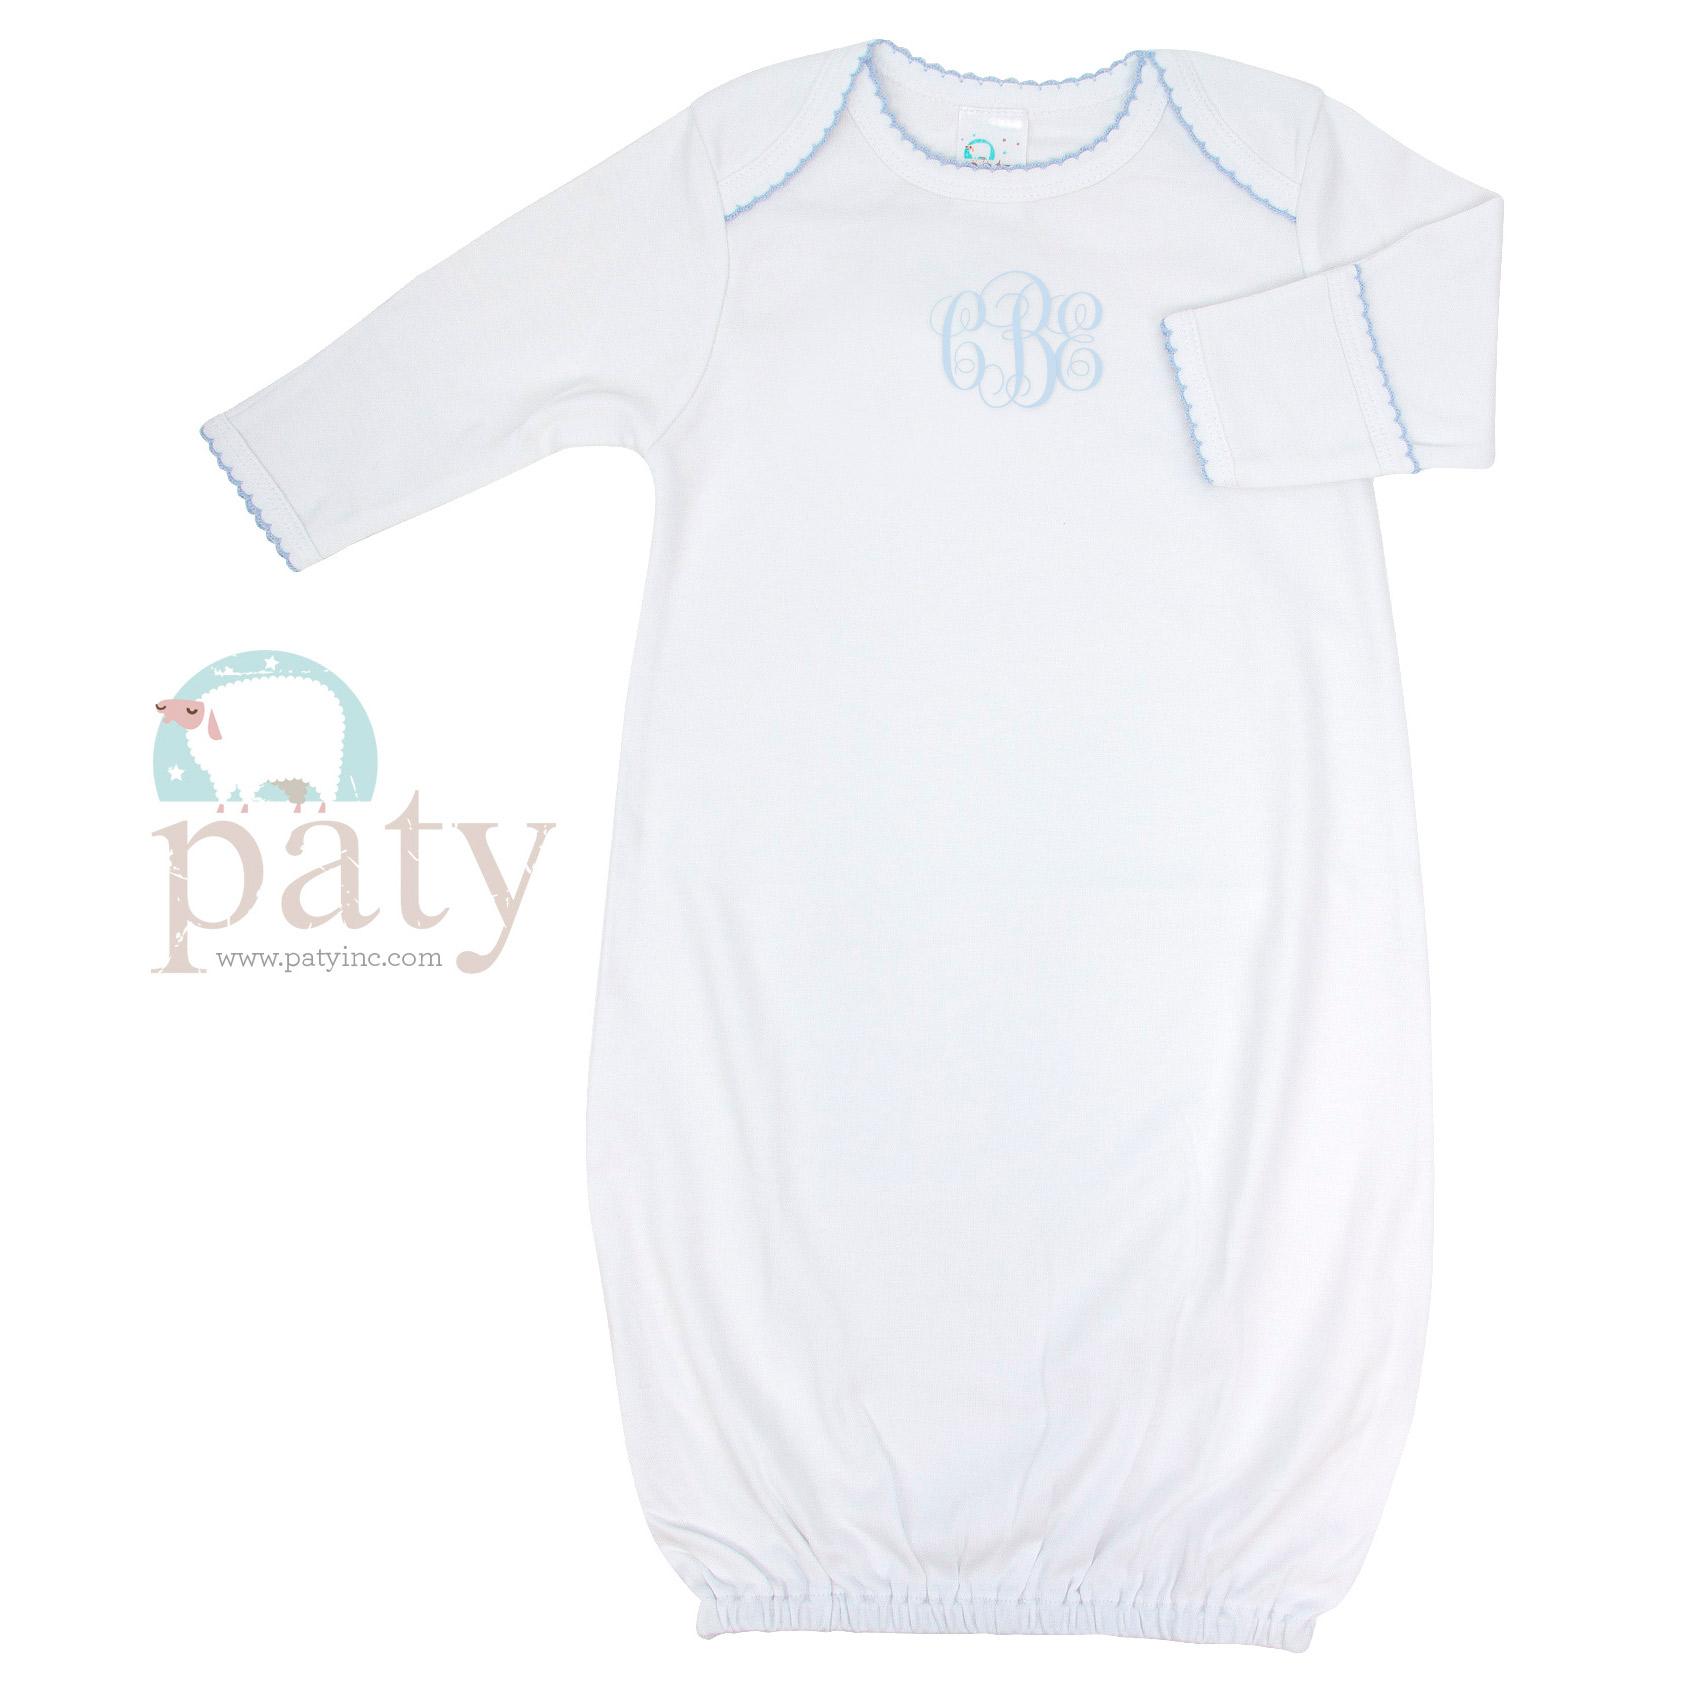 Monogrammed Paty Pima Overlap Shoulder Gown